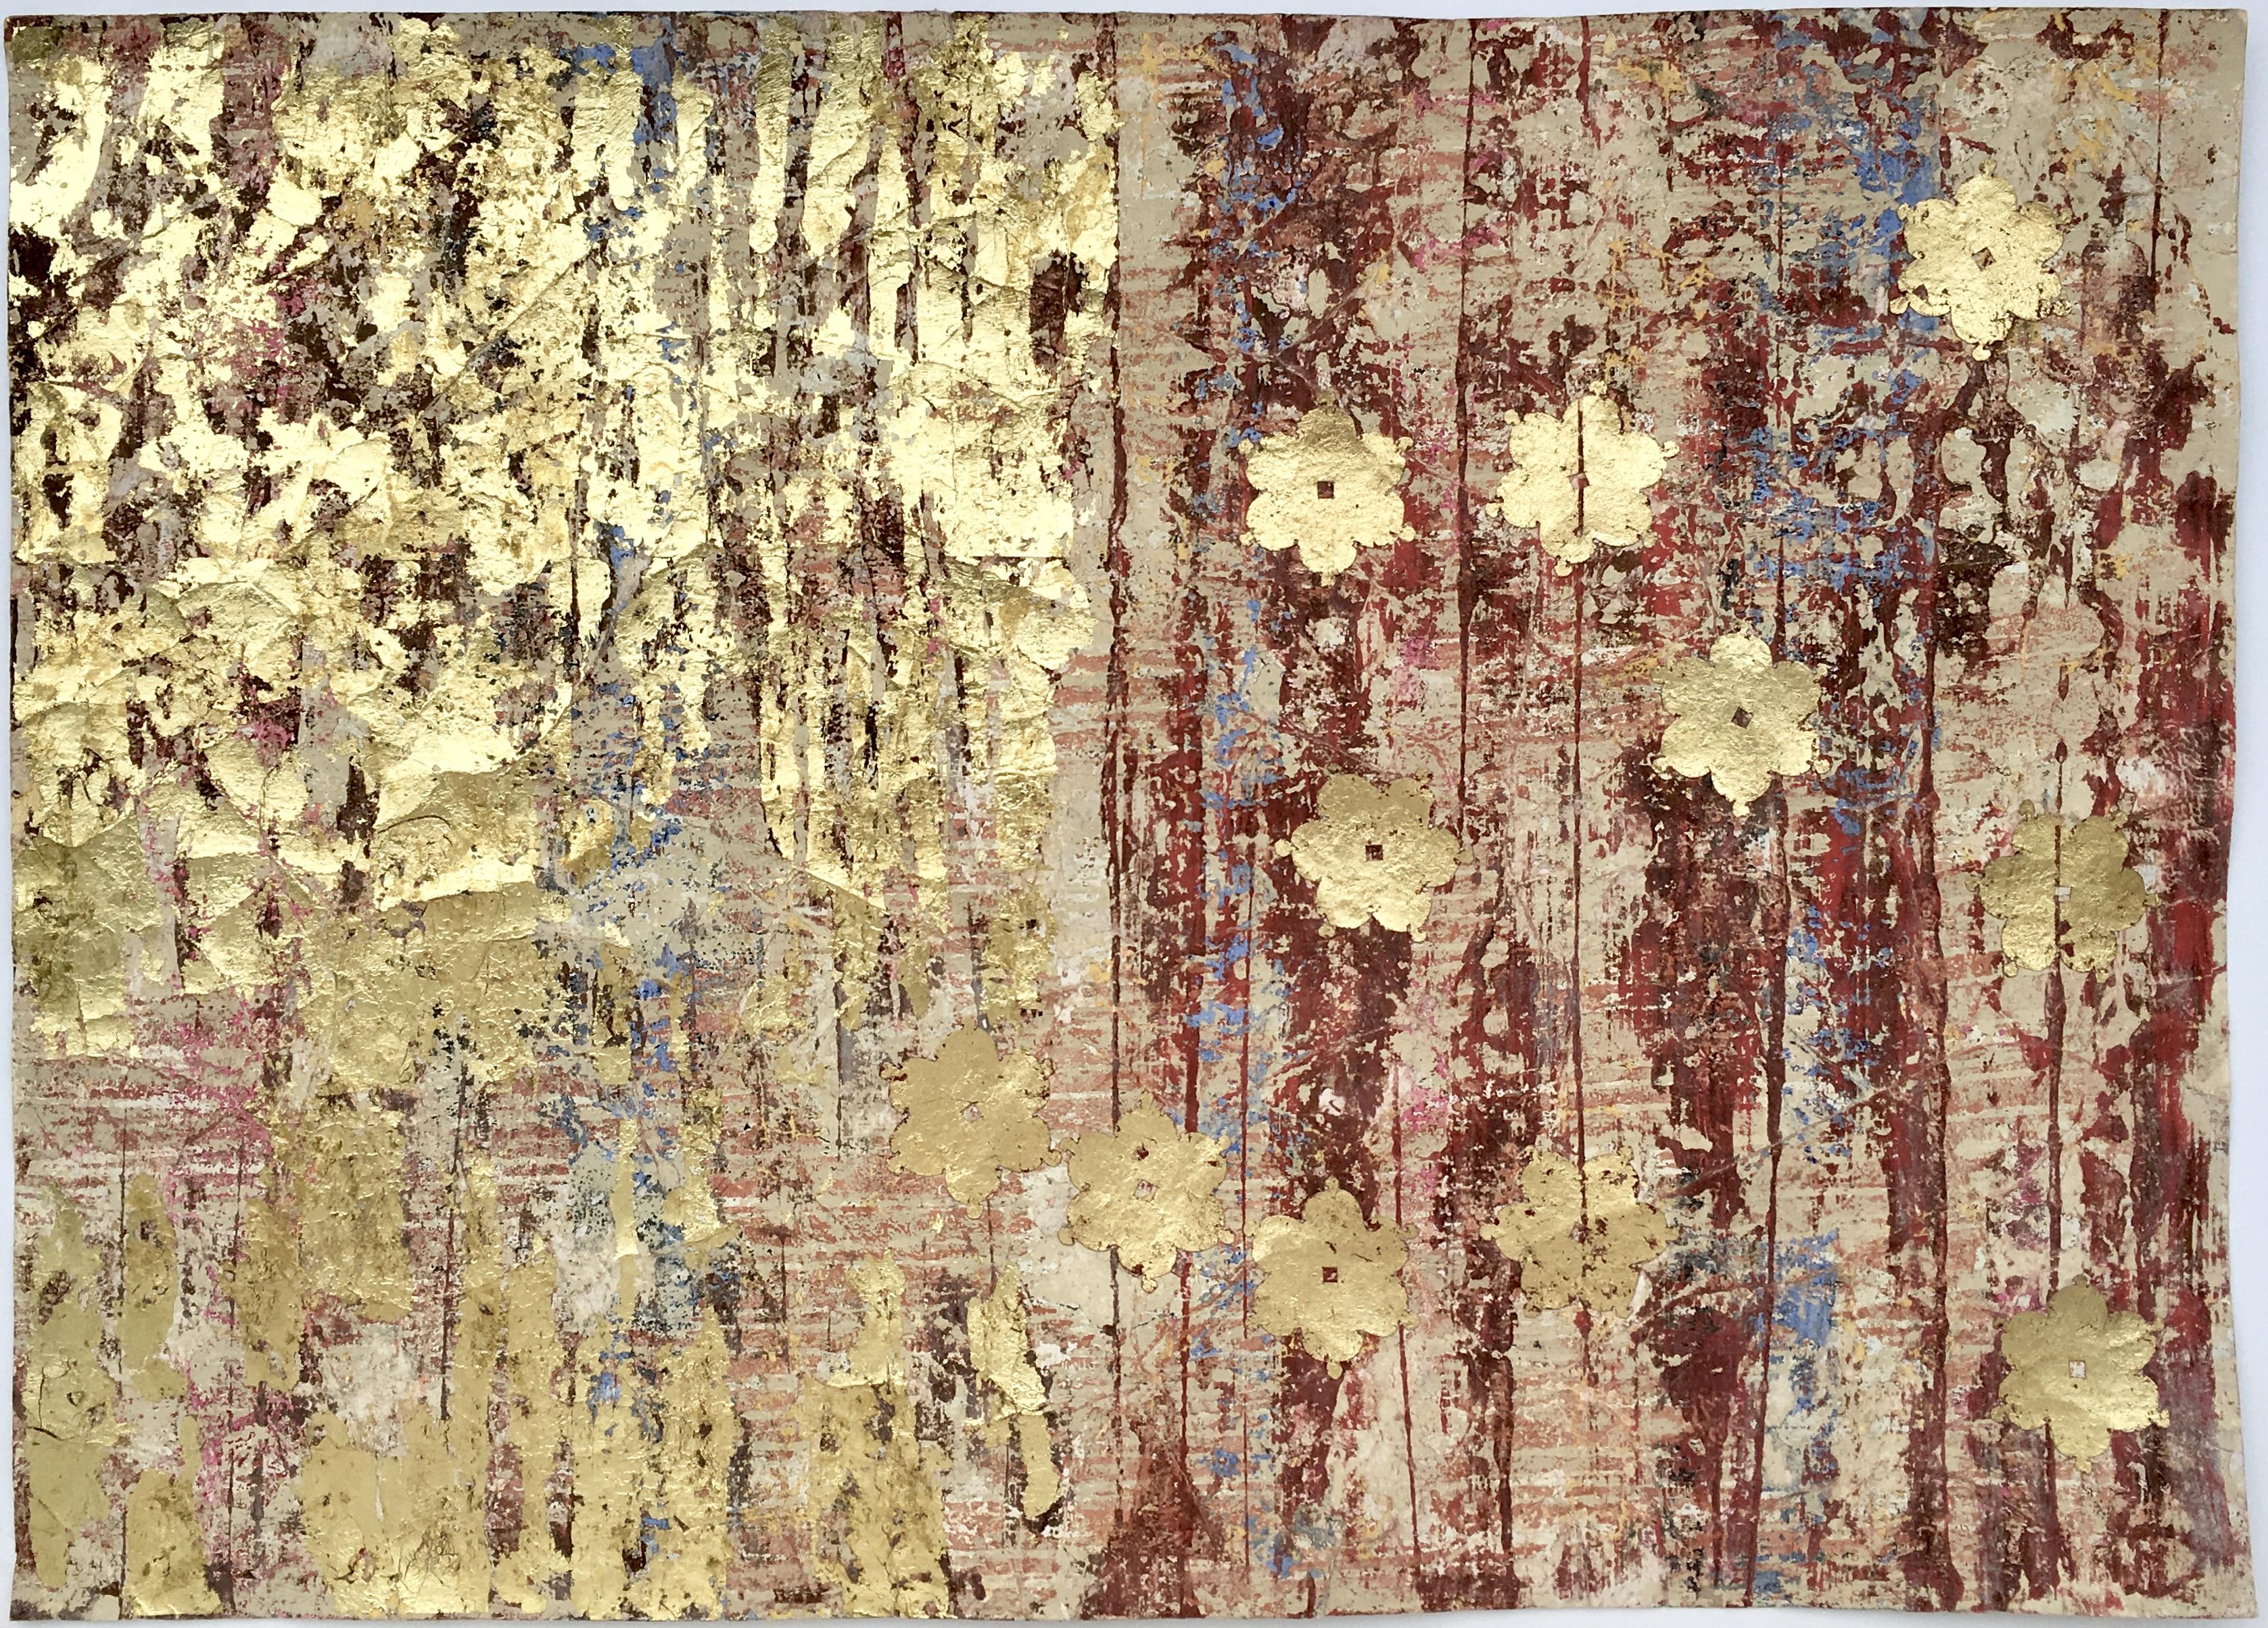 Alan James McLeod, Abstract Artist